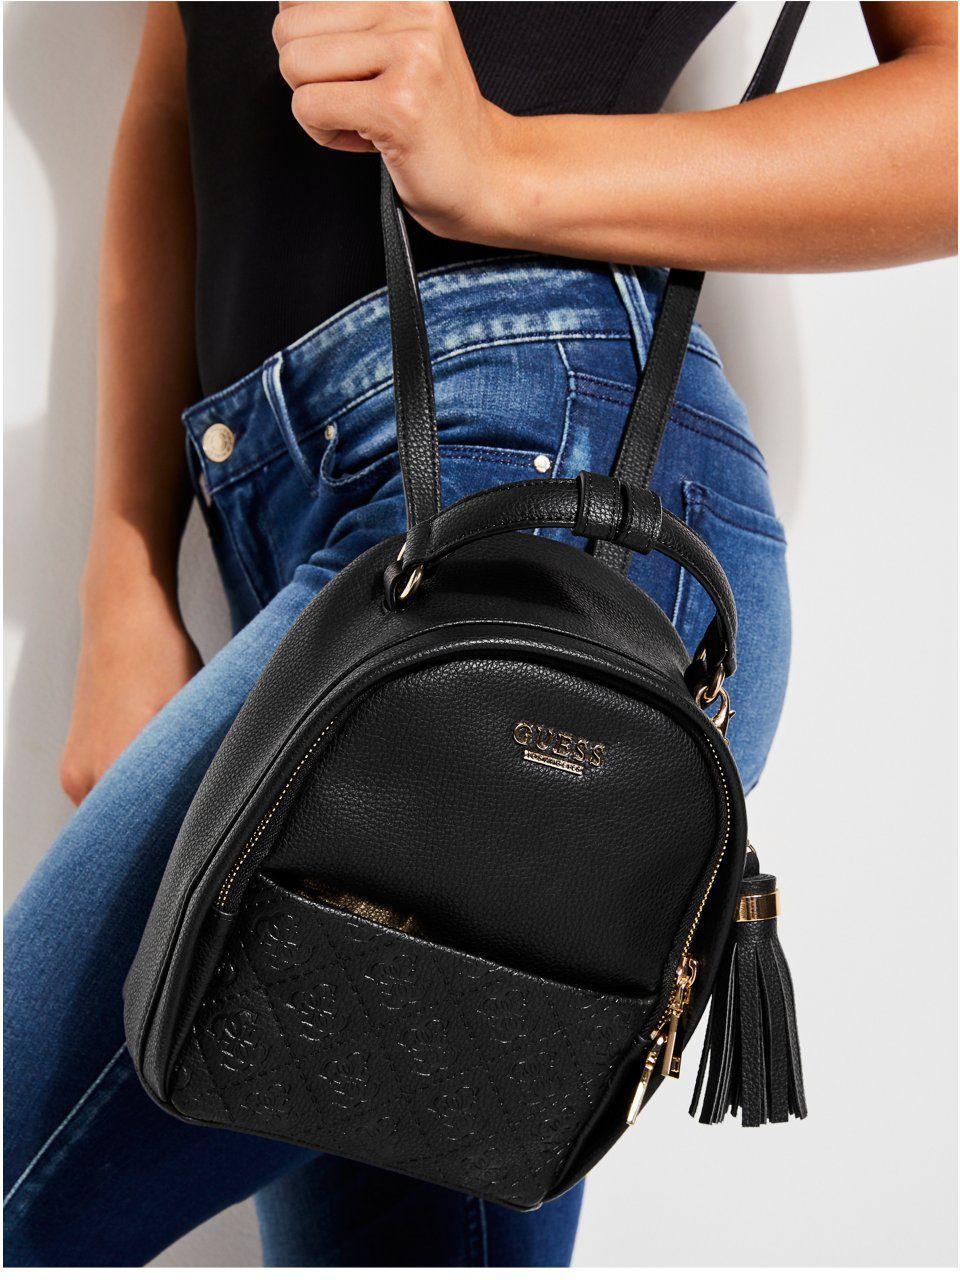 4352d25cd5b Clara Mini Convertible Backpack in 2019   Products   Mini backpack ...